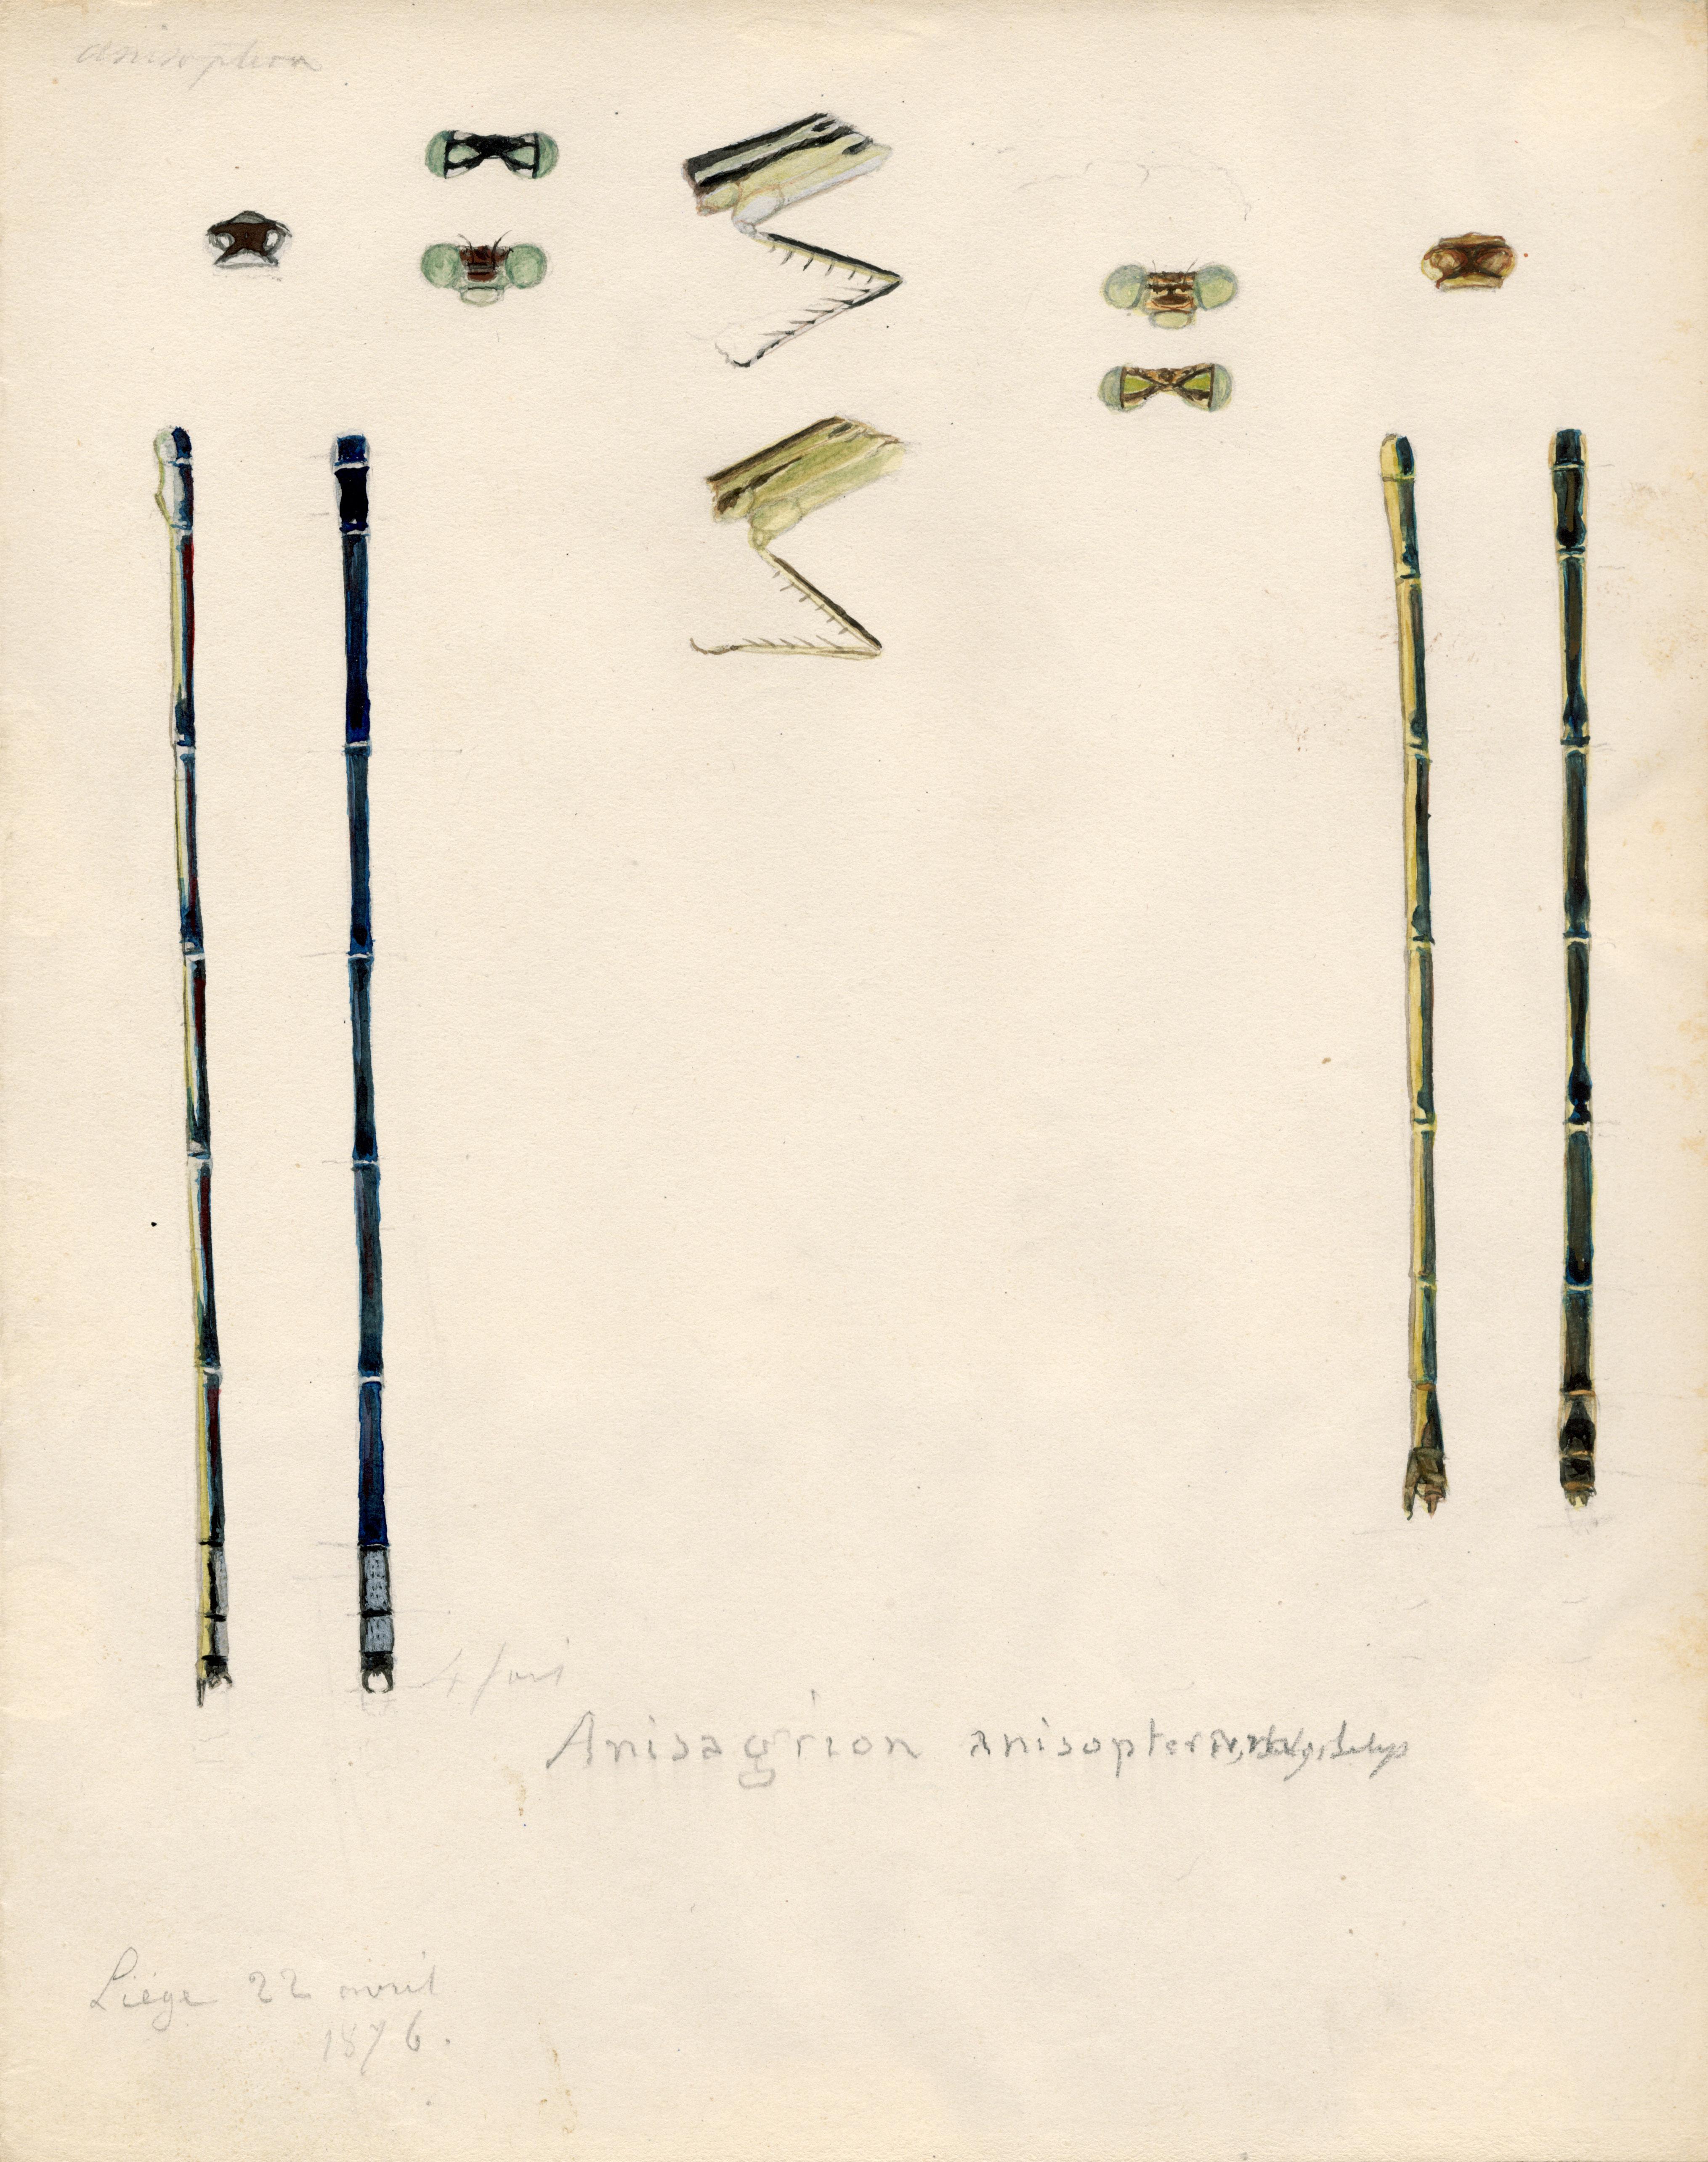 Anisagrion anisopterum.jpg